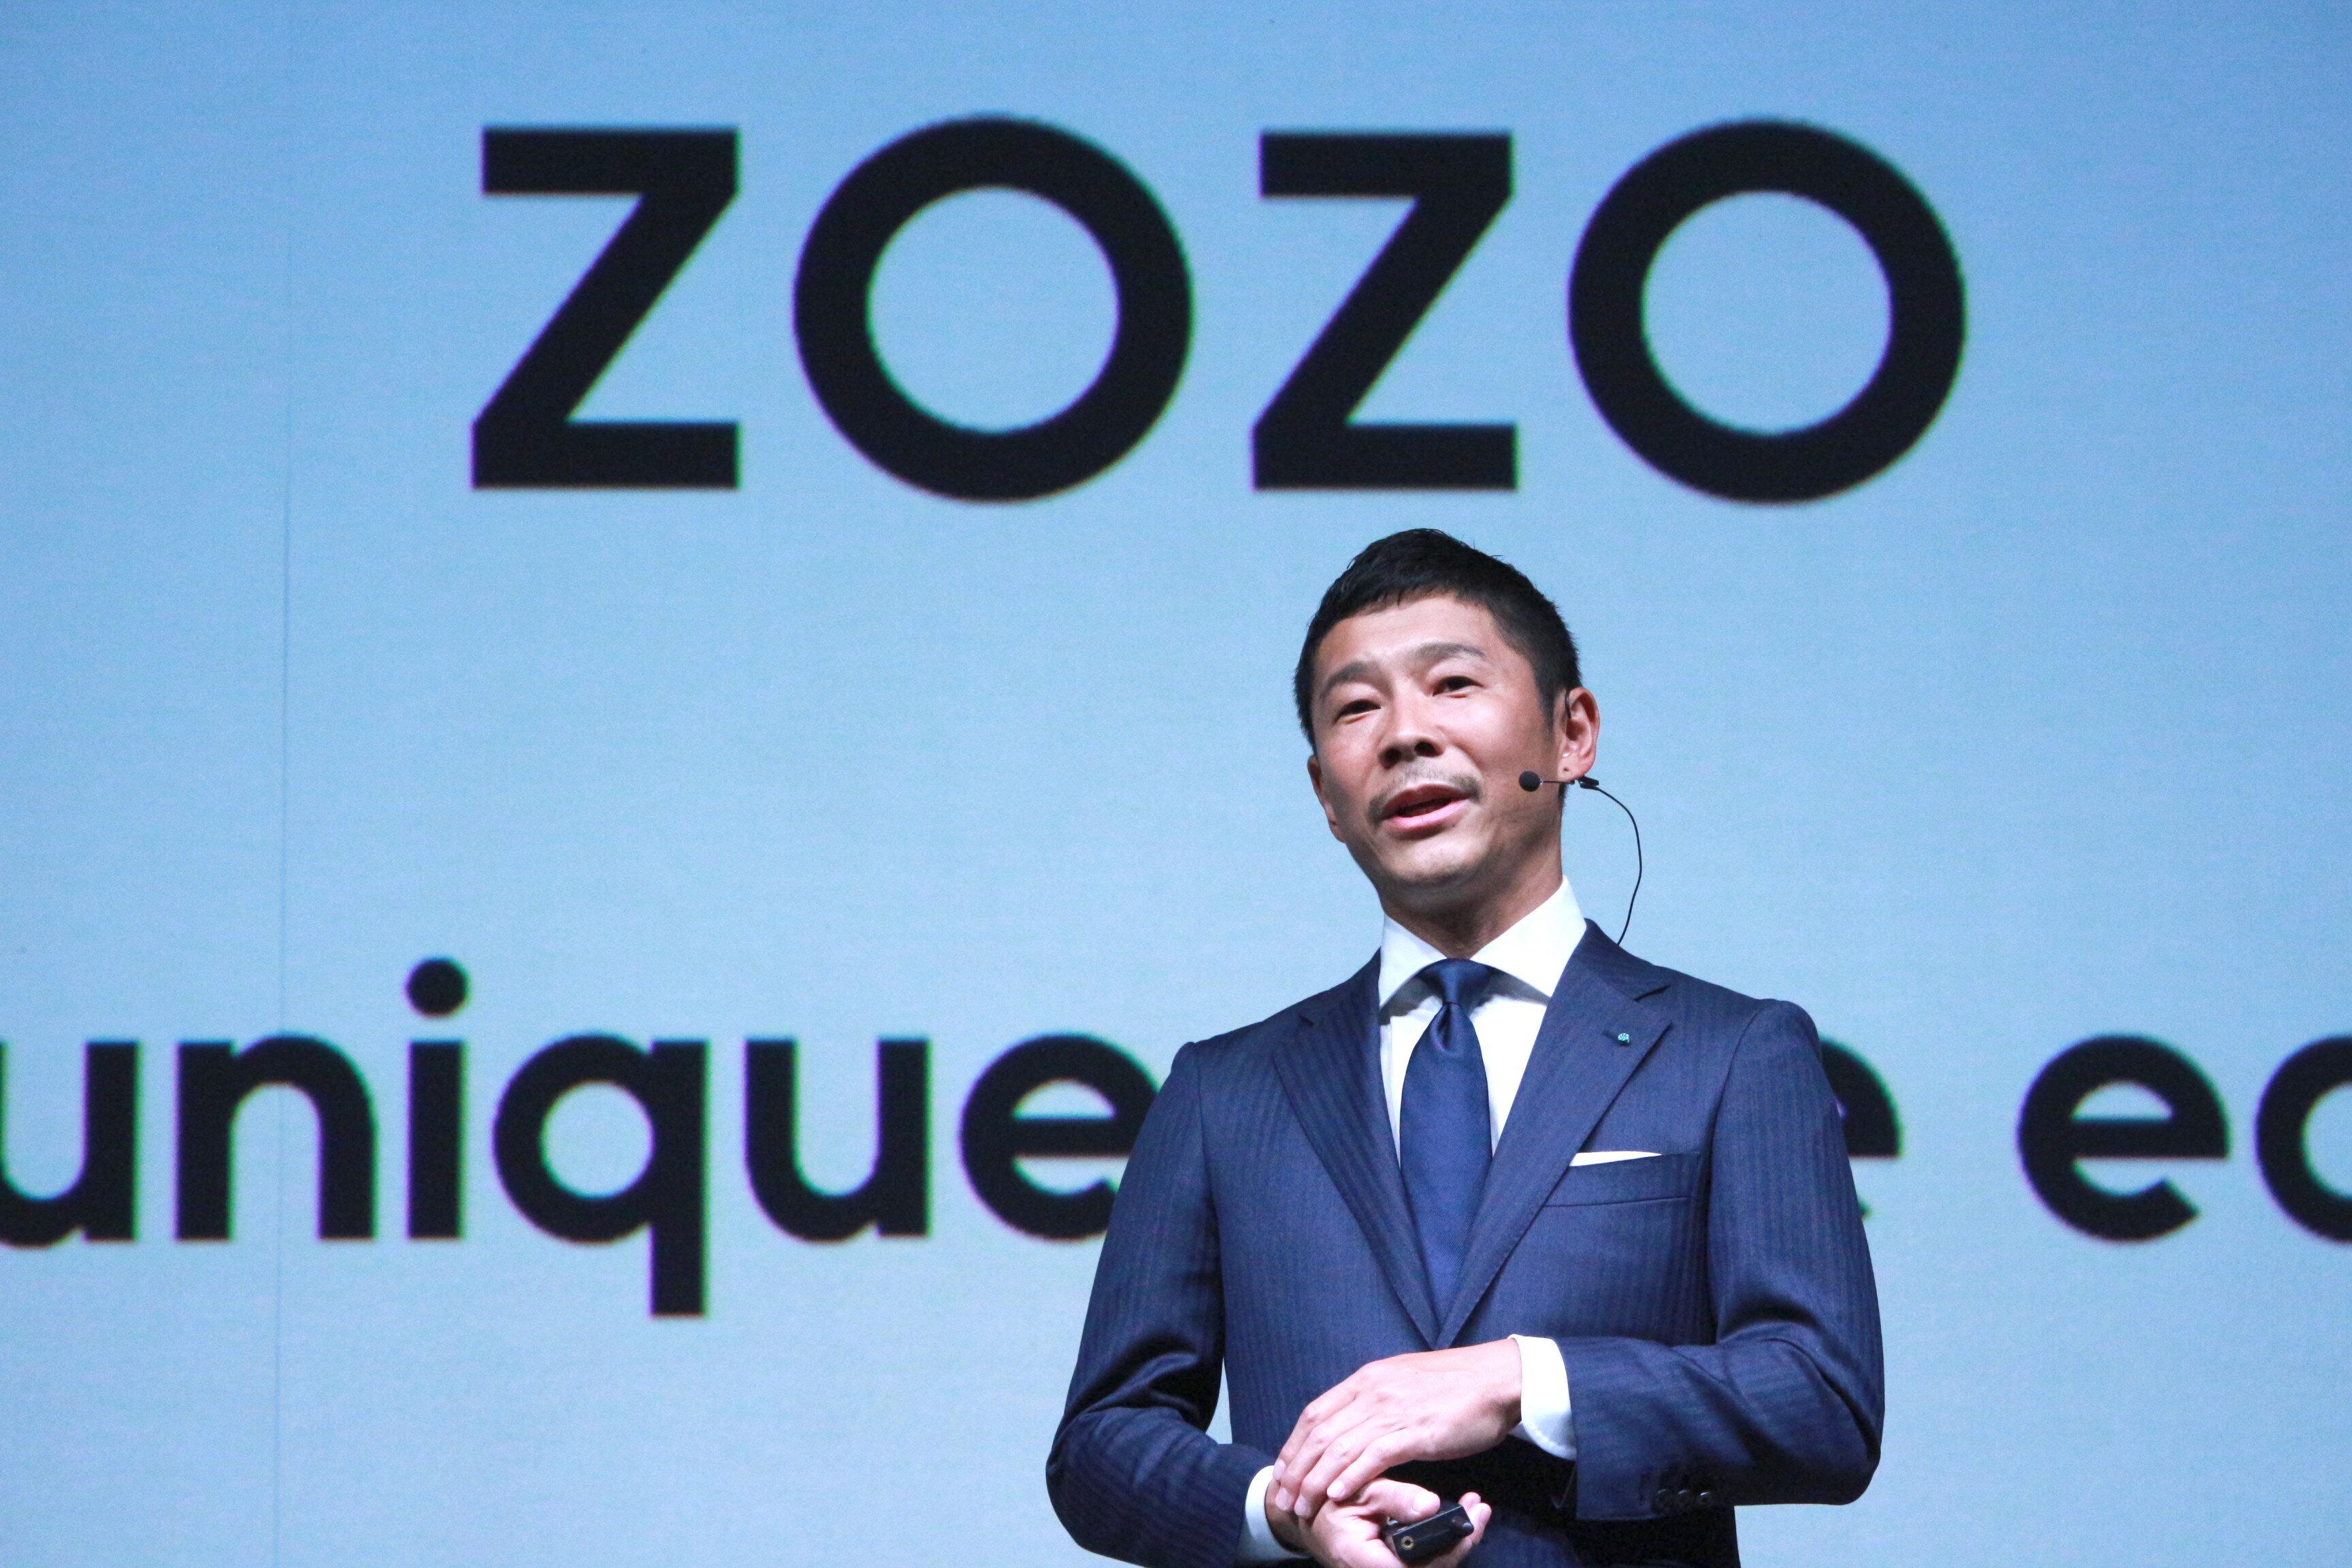 ZOZO、アルバイト2000人を採用へ 週4勤務の時給、1000円から1300円にアップ